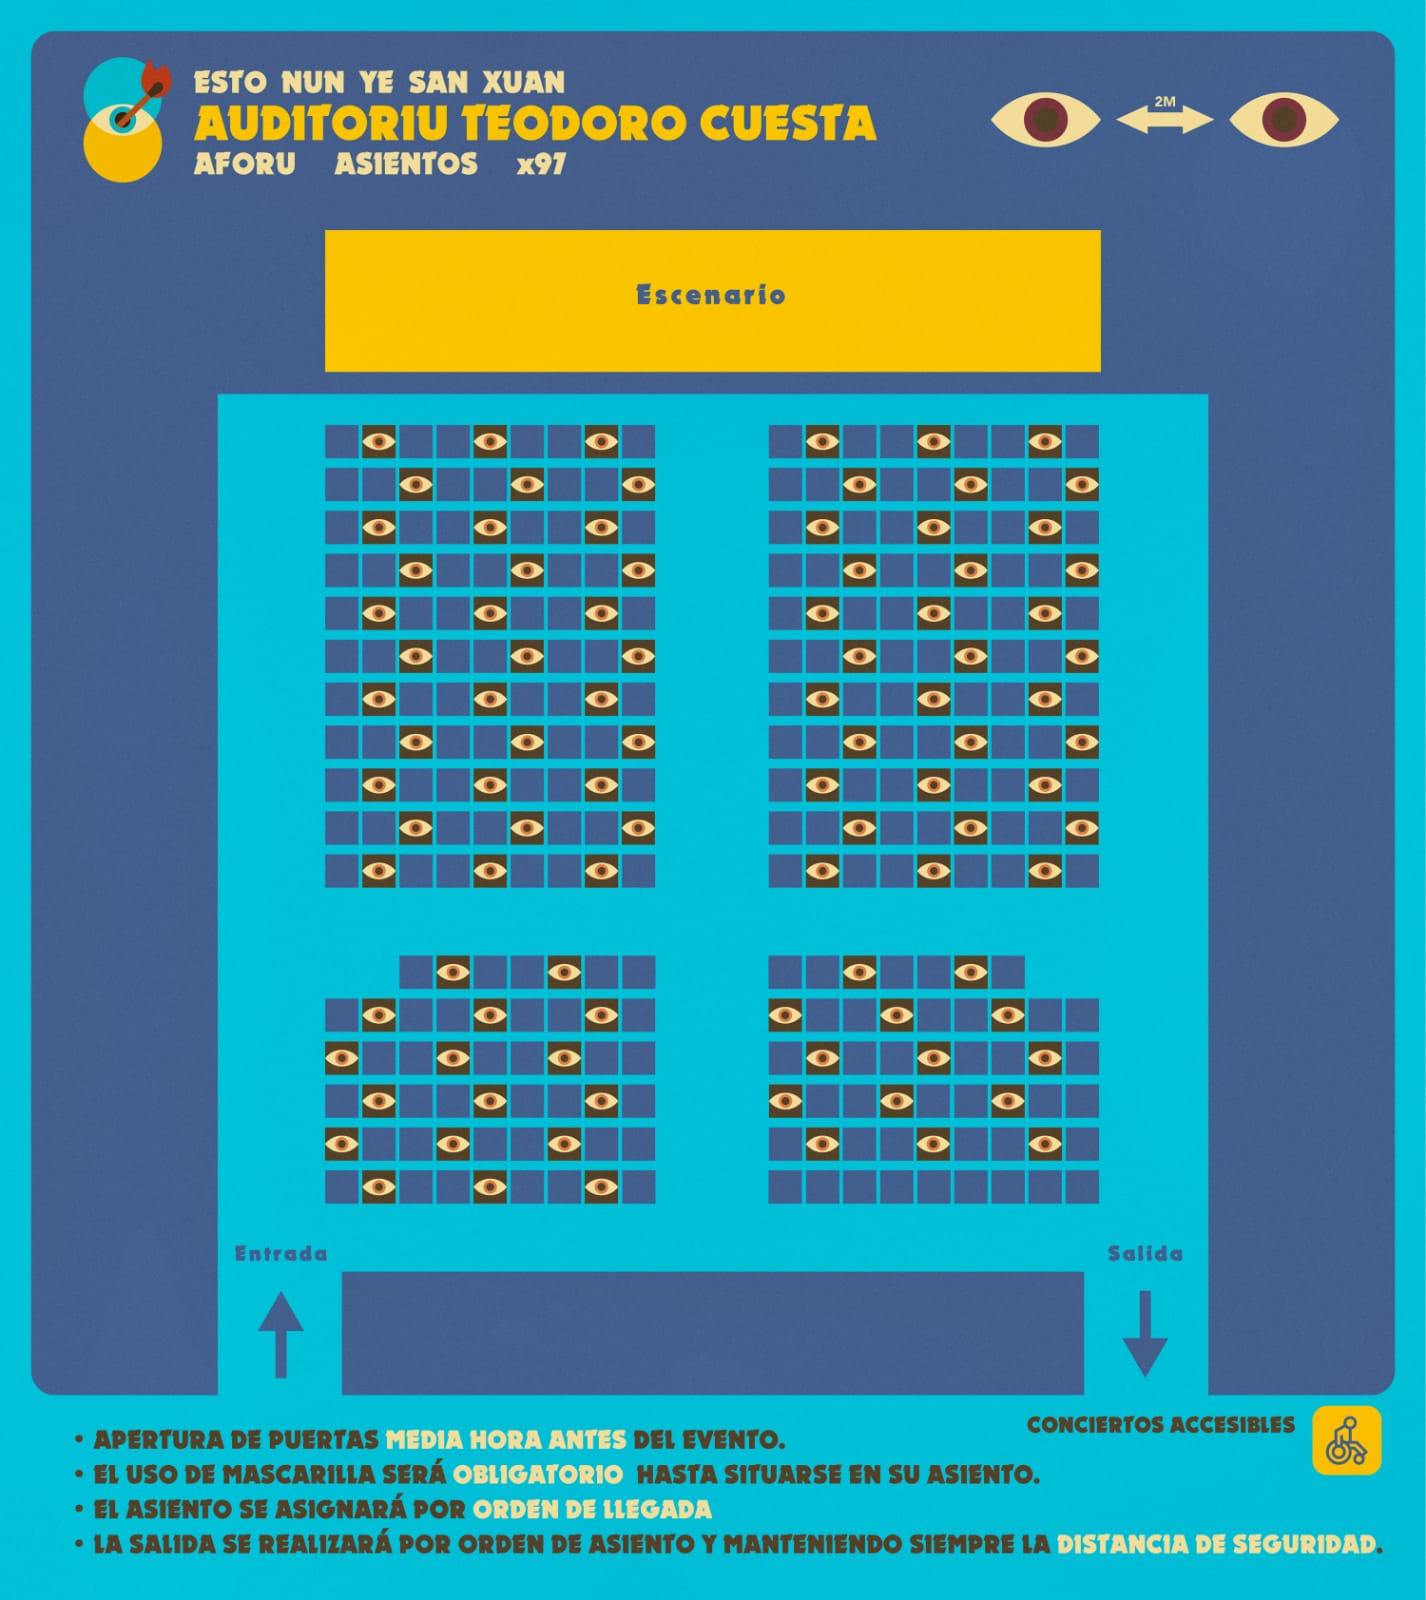 Escenario Auditoriu Teodoro Cuesta